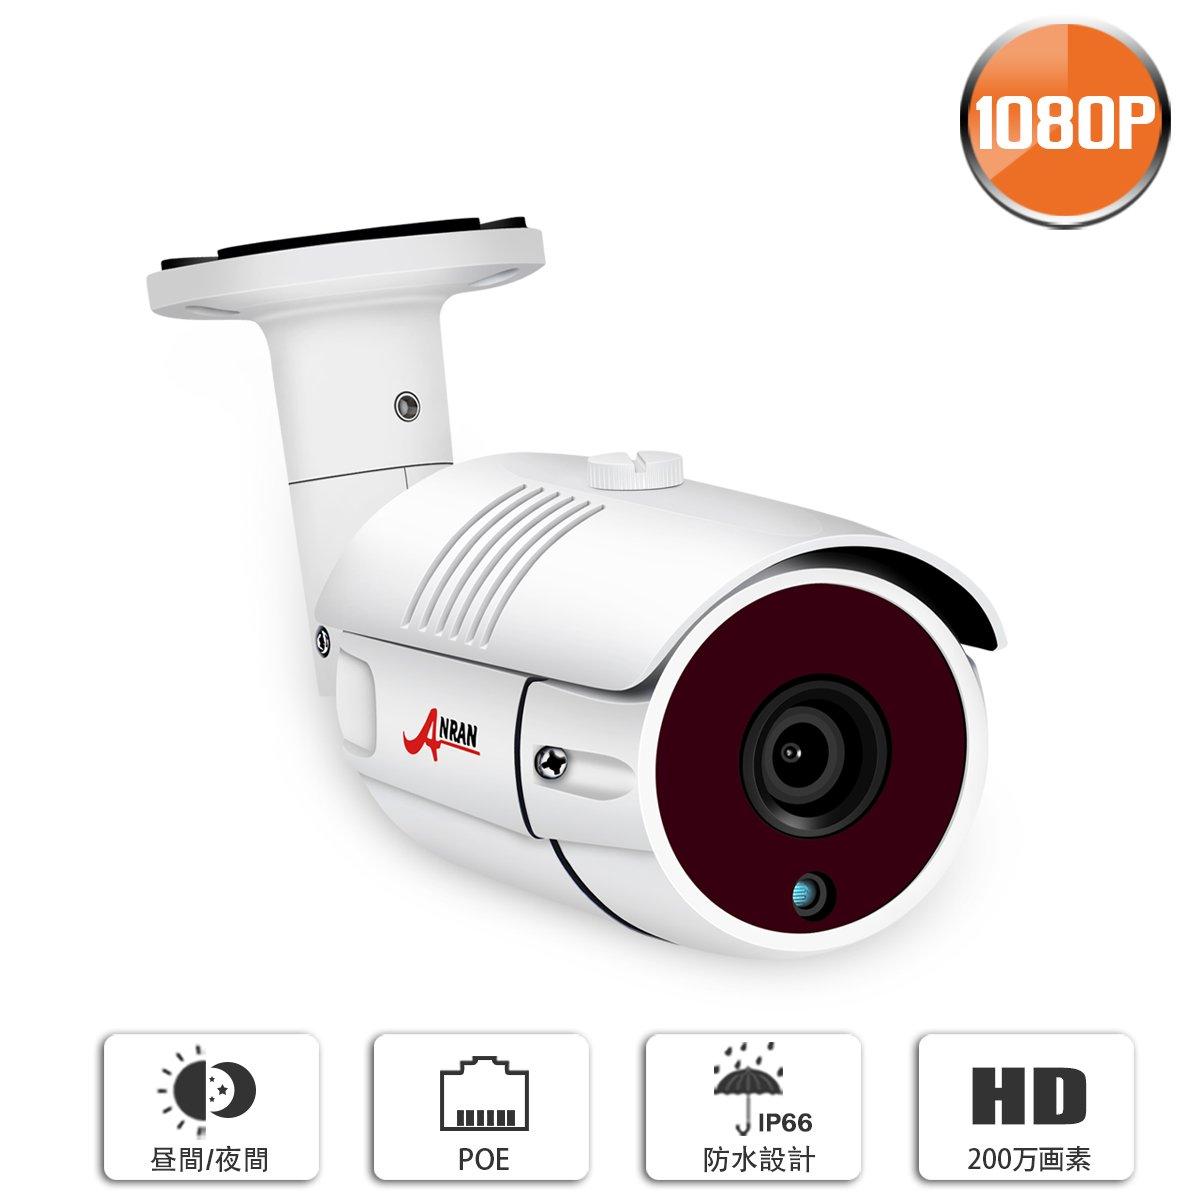 ANRAN POEカメラ 200万画素 防犯カメラ 屋内/屋外 ネットワークカメラ 暗視撮影 cctv ナイトビジョン 遠隔監視 スマホpc対応 IP66 防水カメラ カメラ一台 国内サービス拠点に予備品を完備 B077928W6Z POEカメラ 単体 POEカメラ 単体